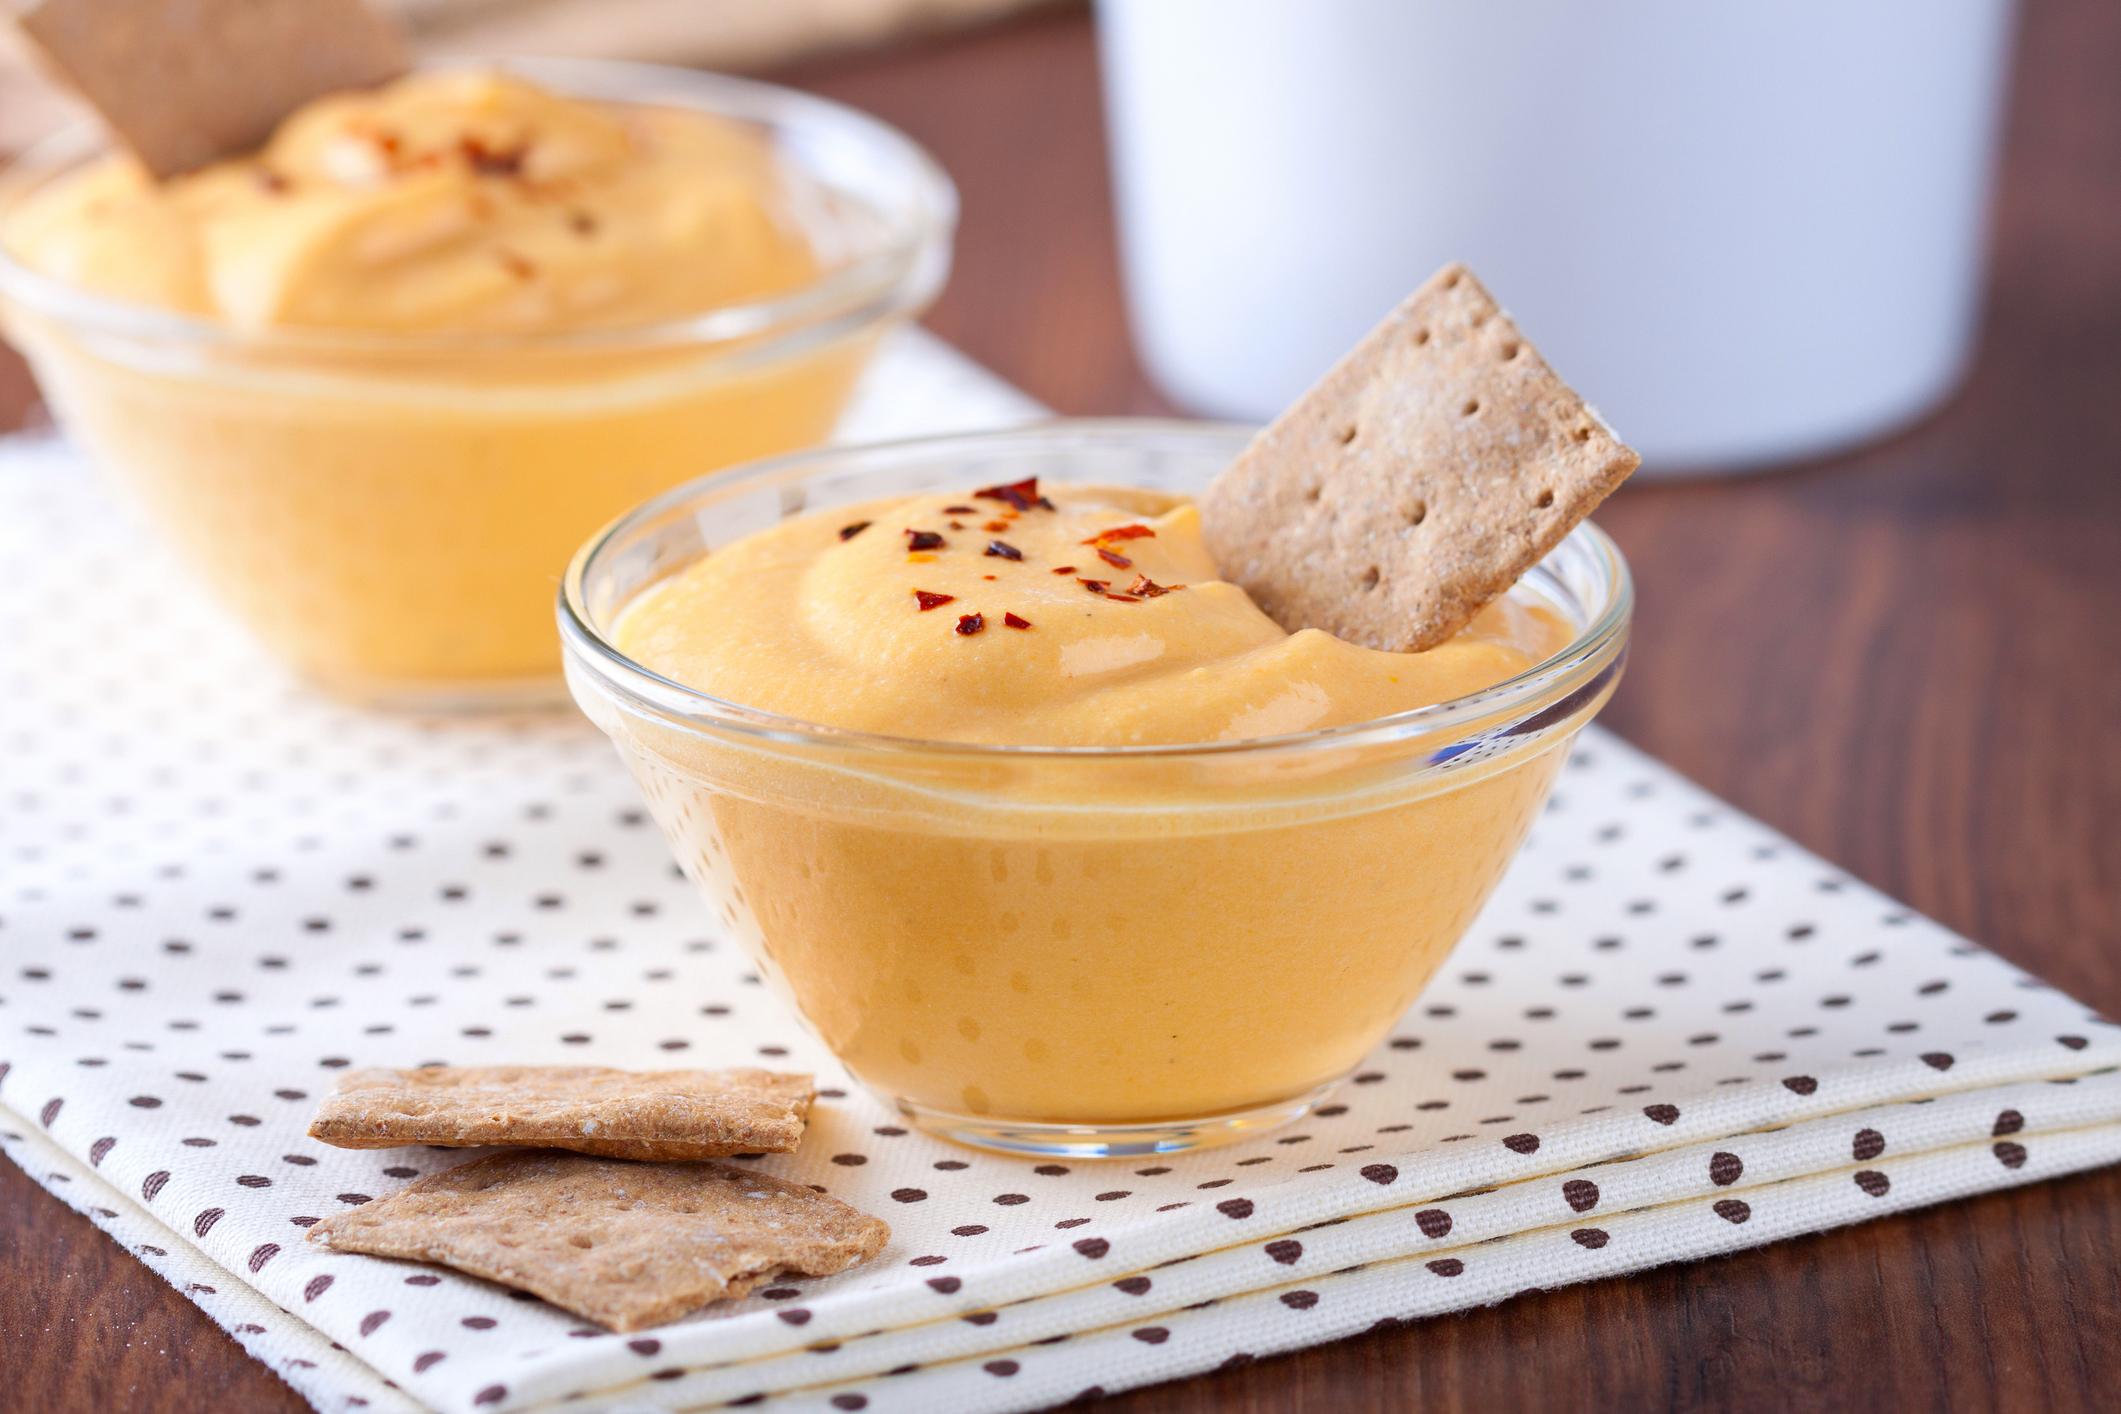 Try our pumpkin dip recipe